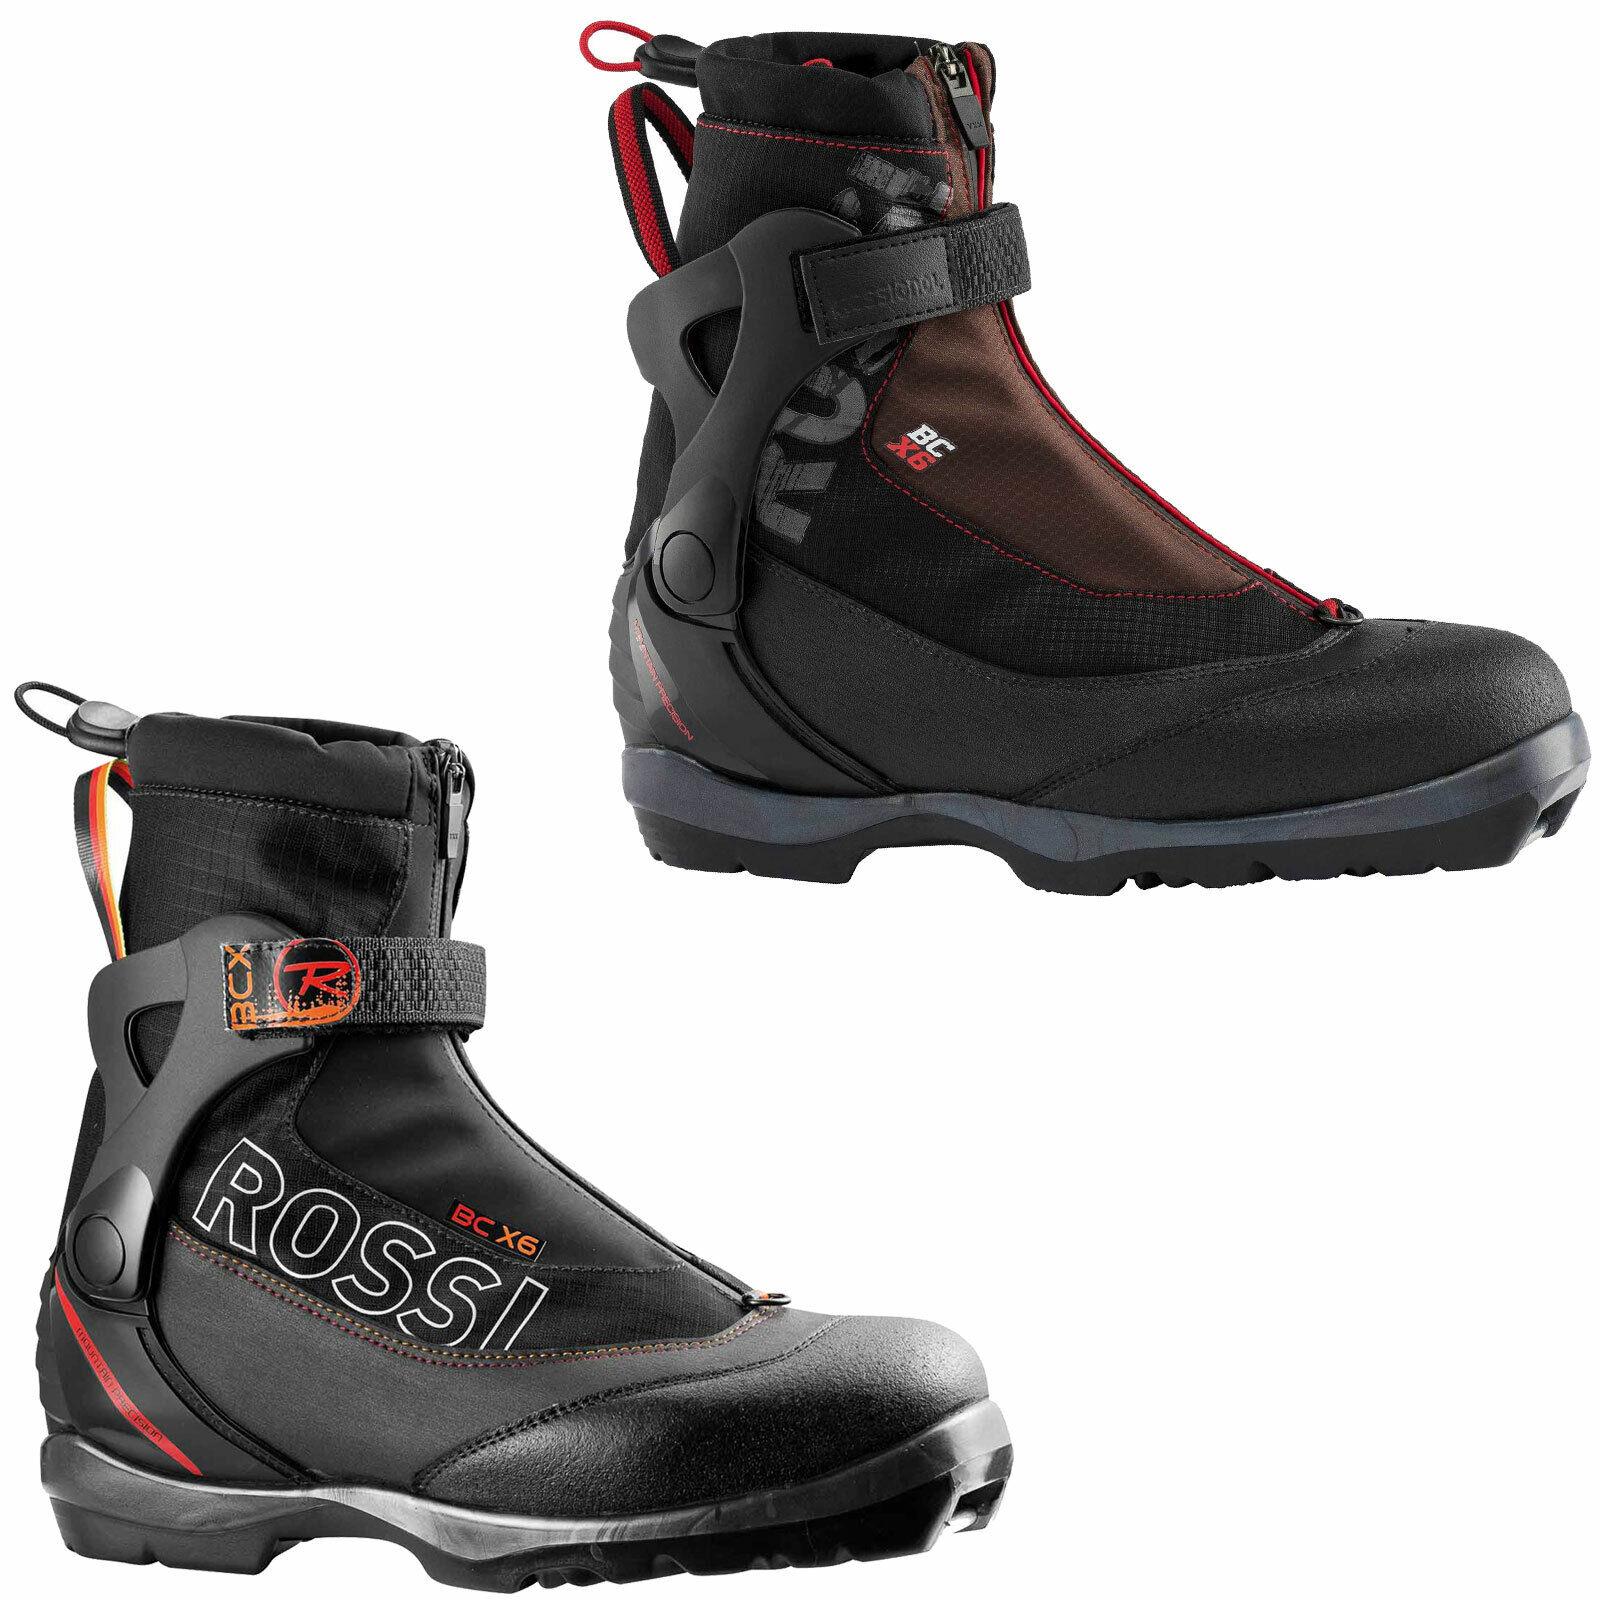 Rossignol BC X-6 Unisex Backcountry Skischuhe